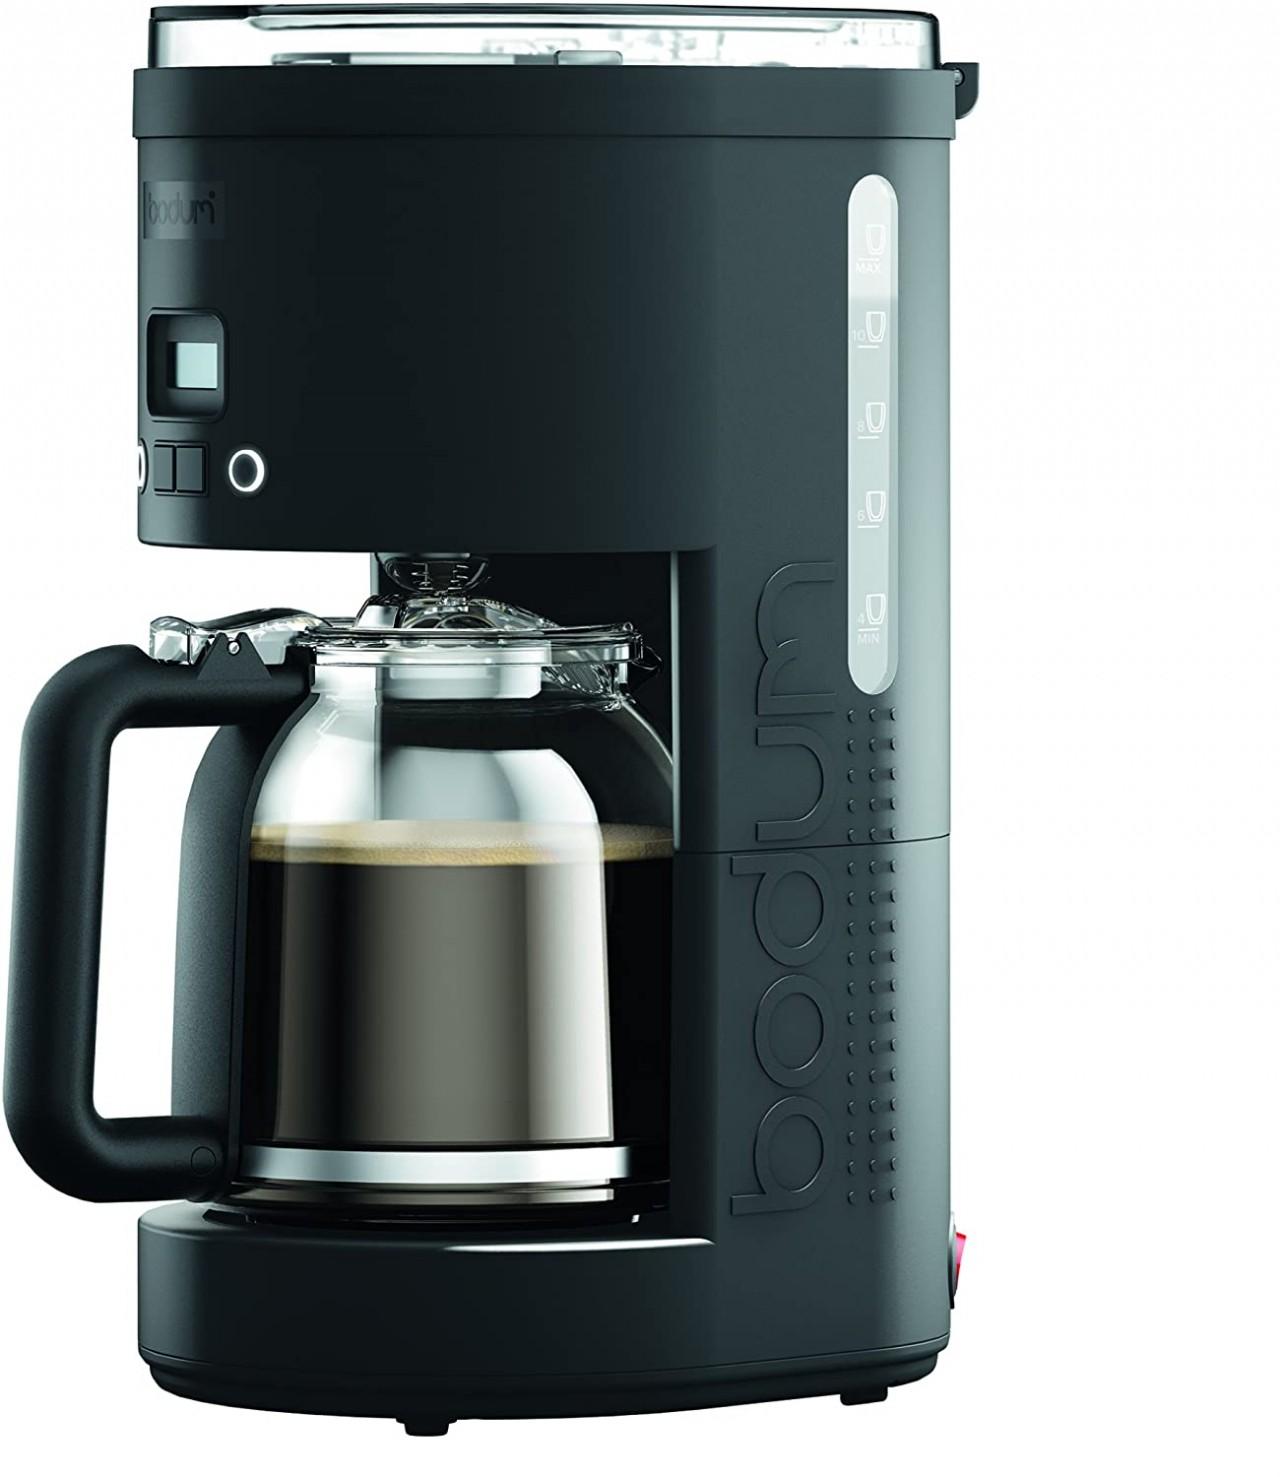 Bodum 11754-01CA Bistro Maker Programmable Coffee Machine with Borosilicate Glass Carafe, 12 Cup